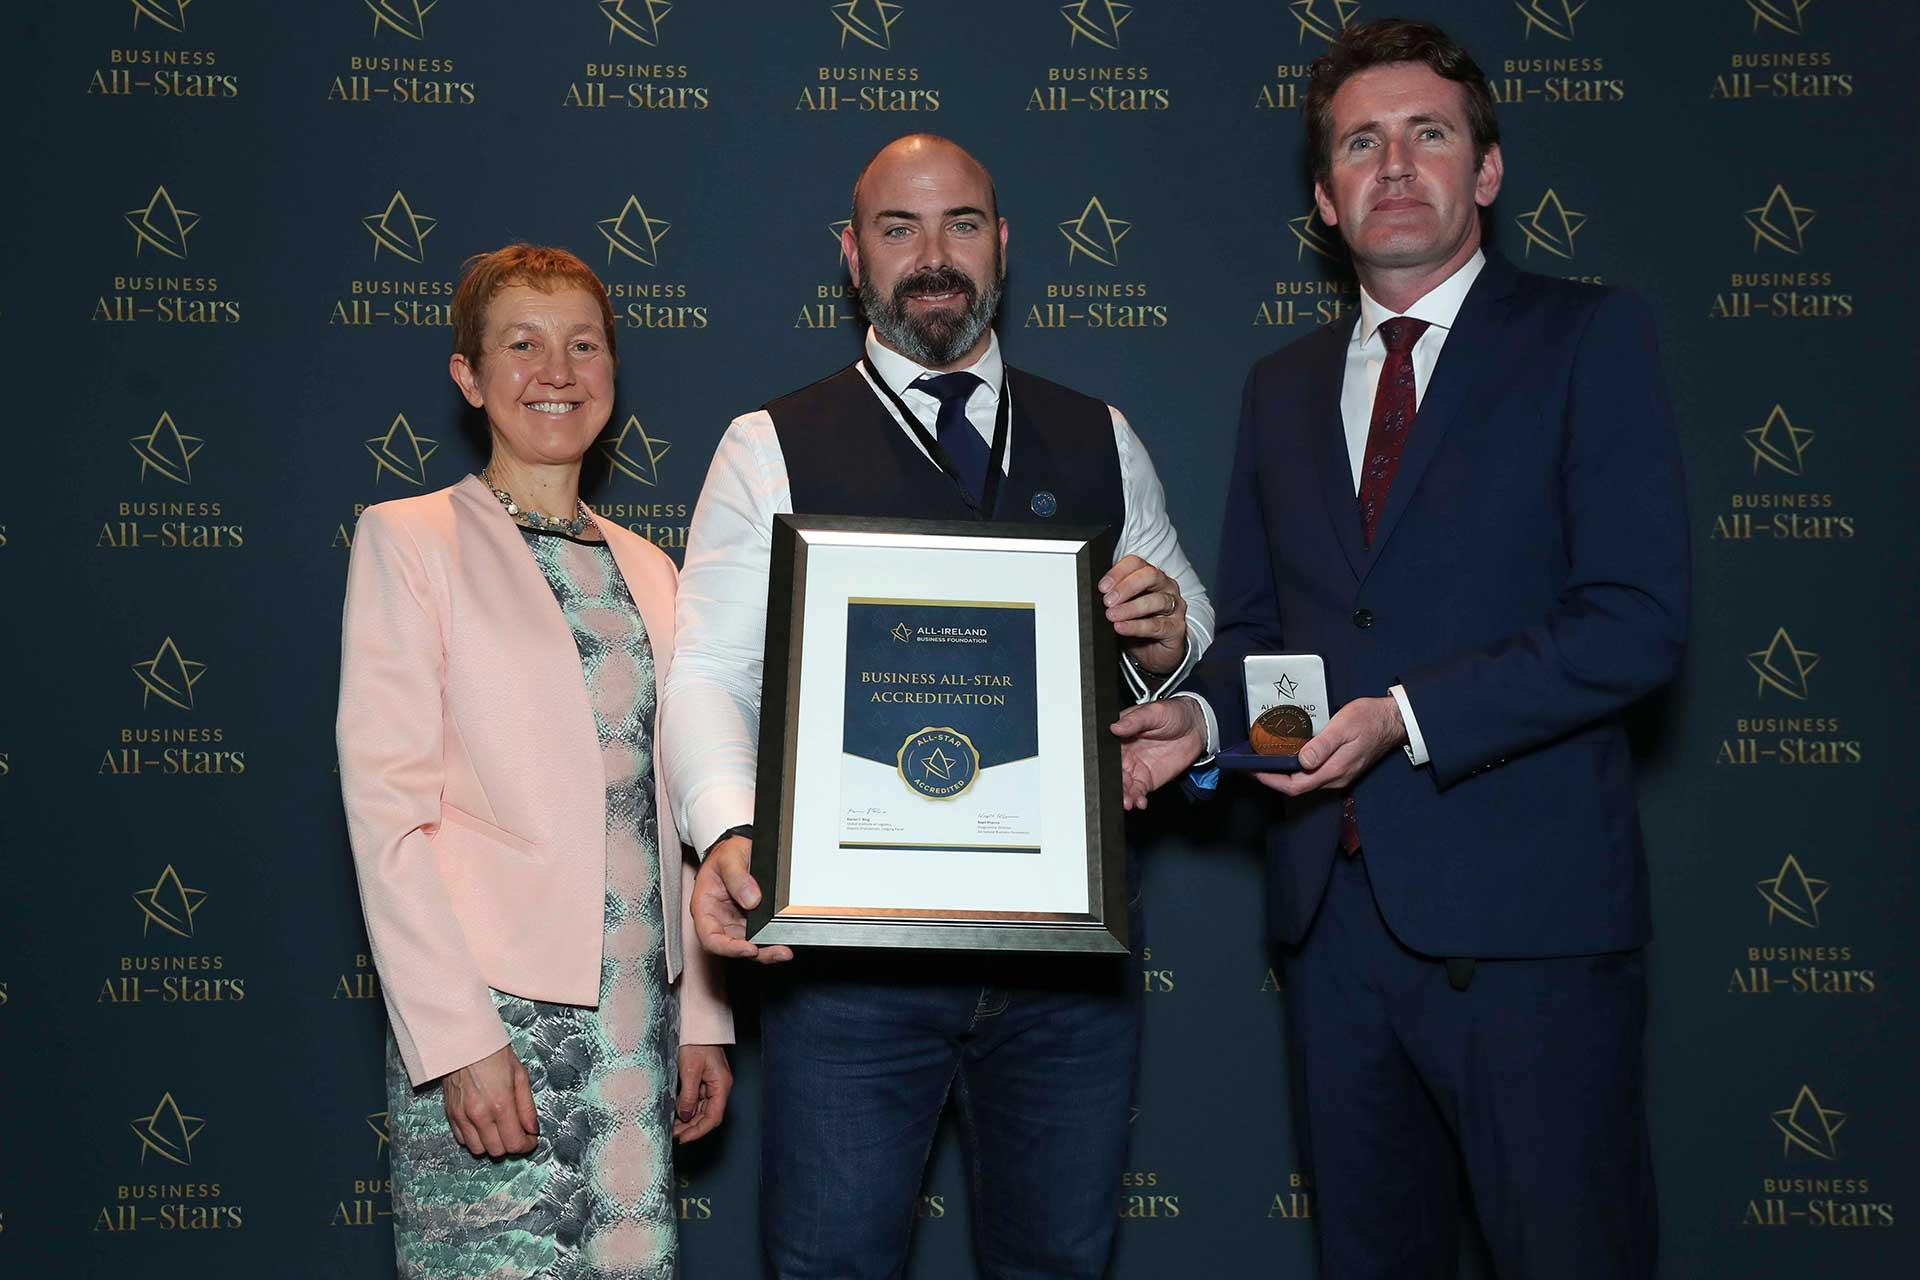 Paddy Richards- iGate receiving Business All-Star Accreditation at Croke Park from Dr Briga Hynes, Kemmy Business School, University of Limerick and Senator Aodhán Ó Ríordáin, Spokesperson on Education and Skills, Gaeilge and the Gaeltacht.